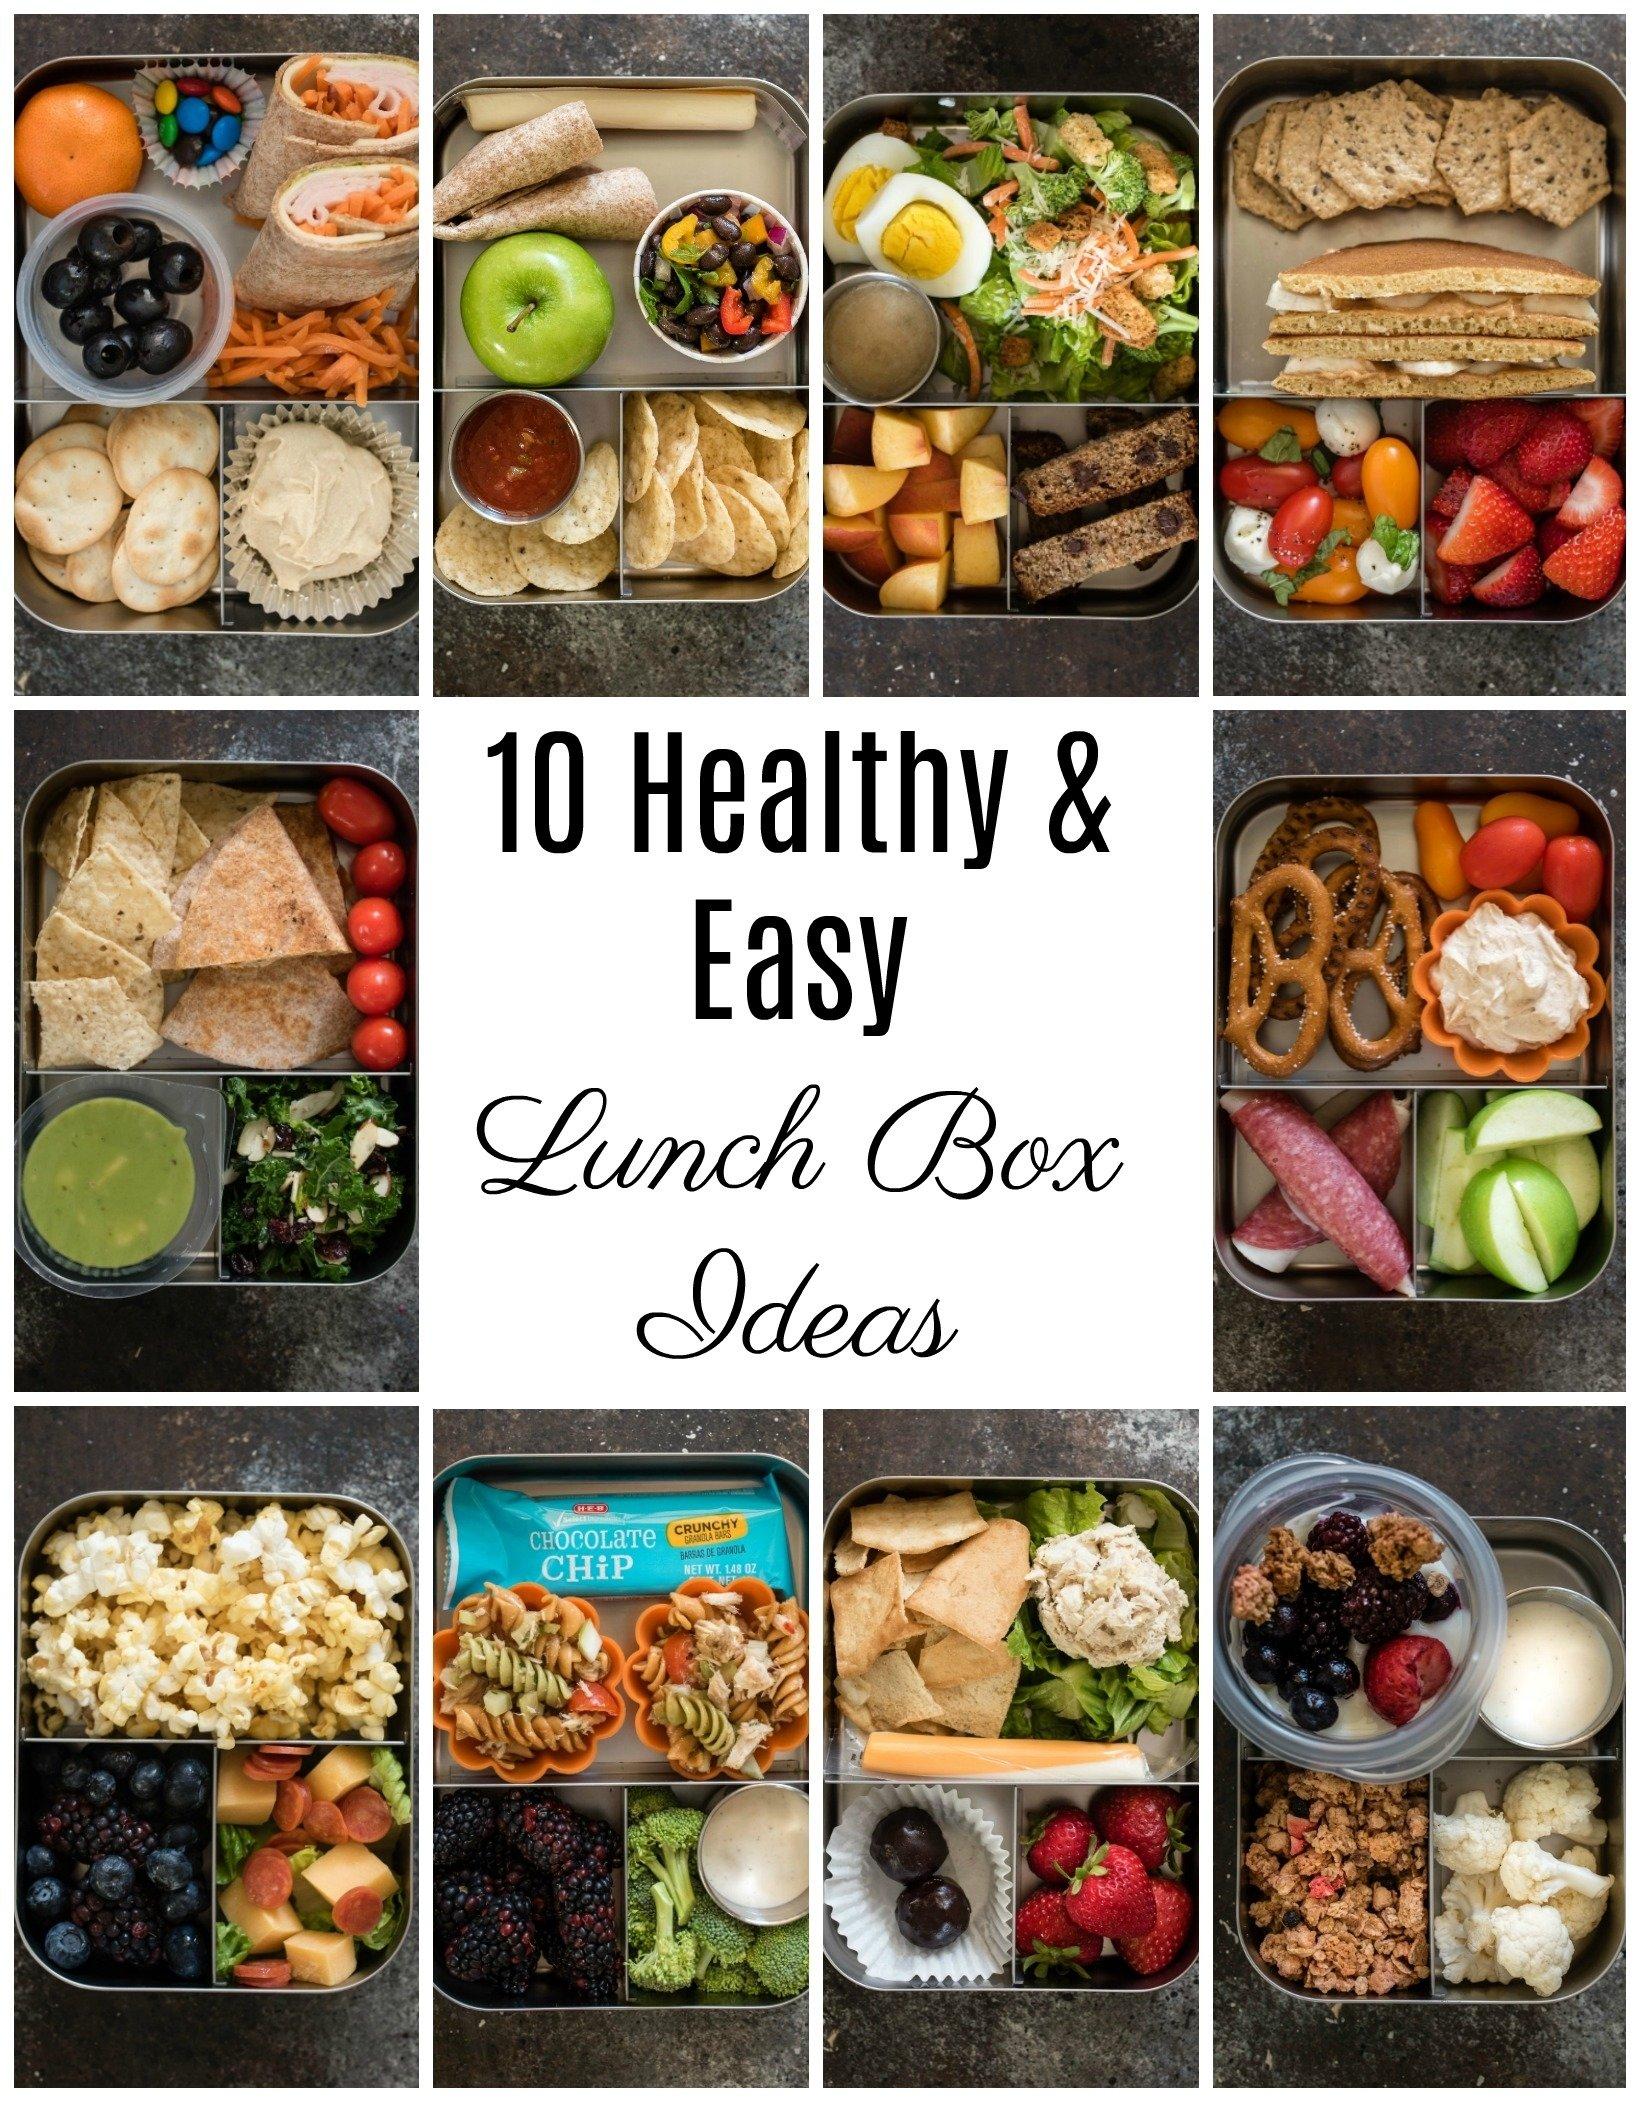 10 Nice Bento Box Ideas For Adults pancake pb banana sandwich and 10 healthy lunch box ideas 19 2020